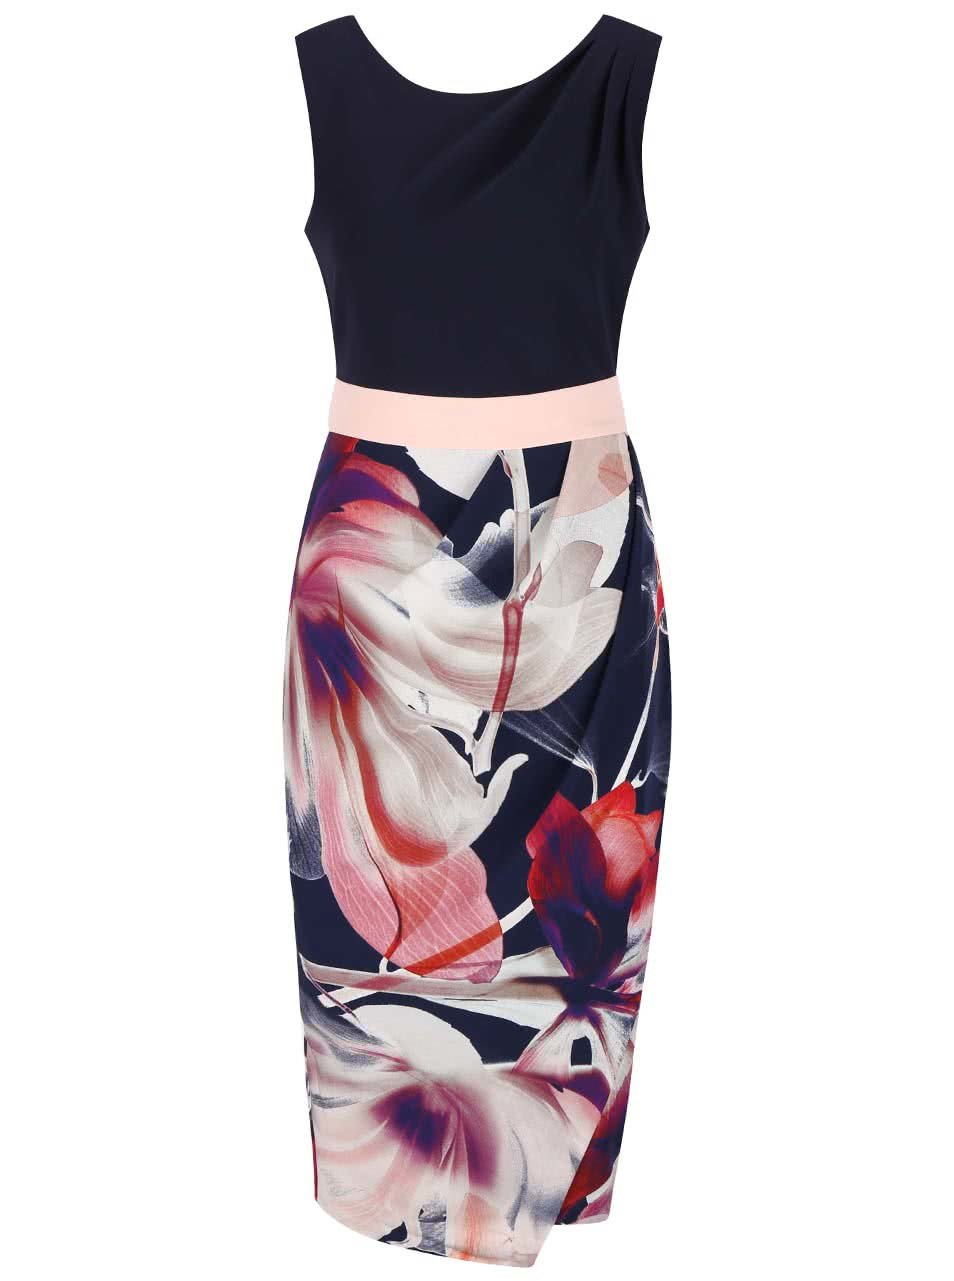 b6f154c82870 Tmavomodré puzdrové šaty s kvetovanou sukňou Closet ...